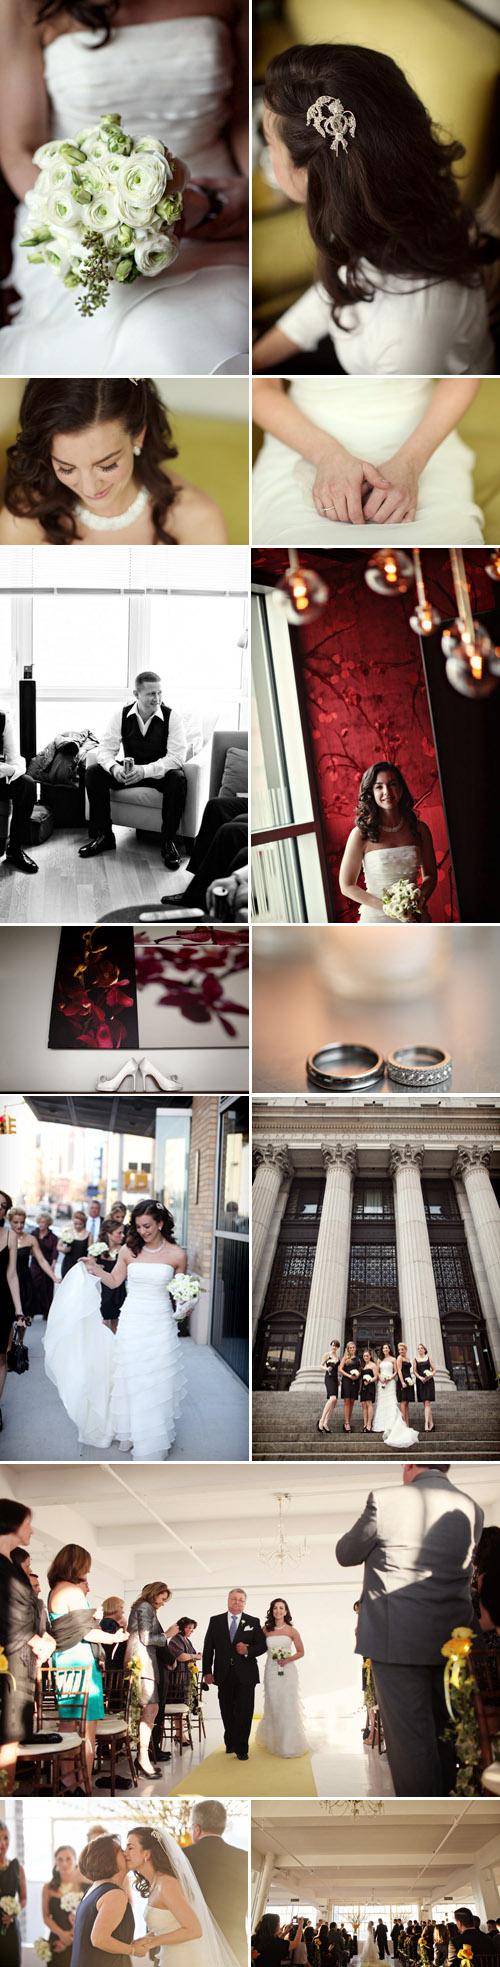 modern New York City wedding at Studio 450, photos by Alison Conklin Photography